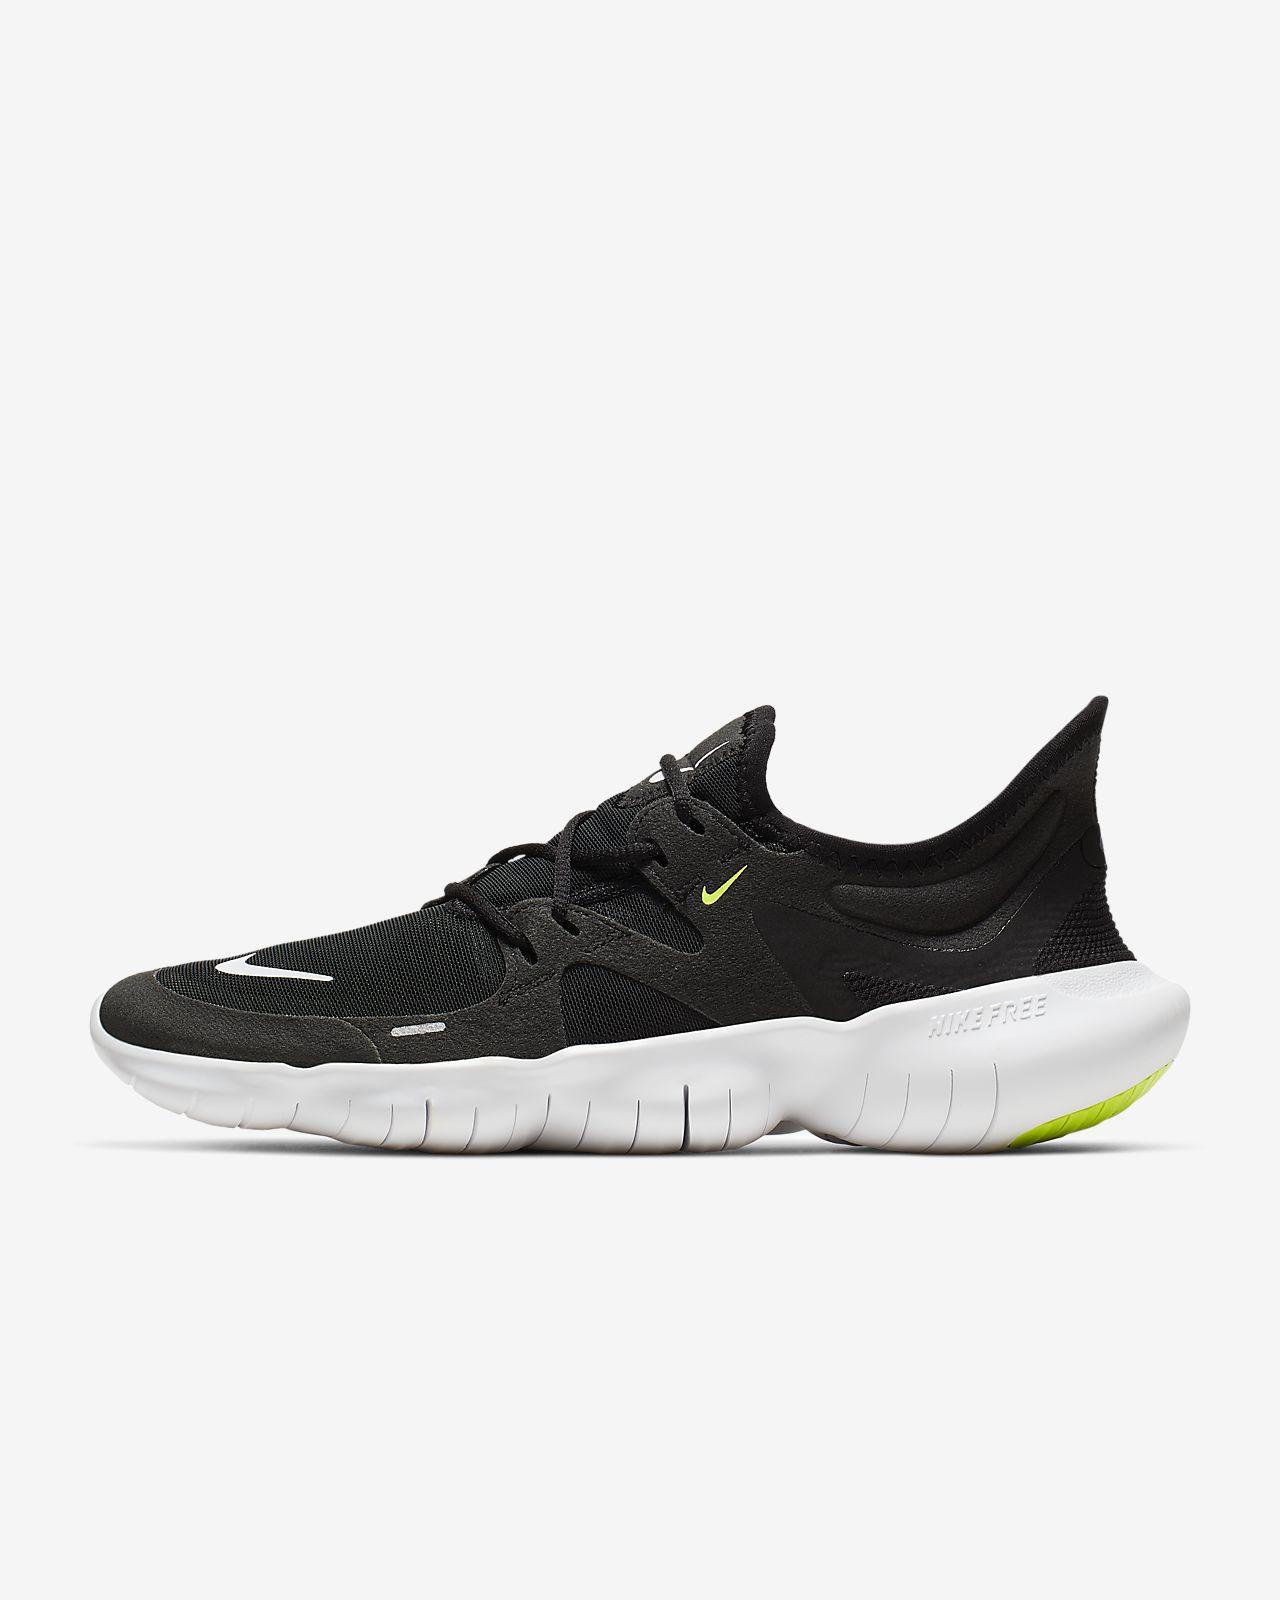 Calzado de running para mujer Nike Free RN 5.0 Icon Clash